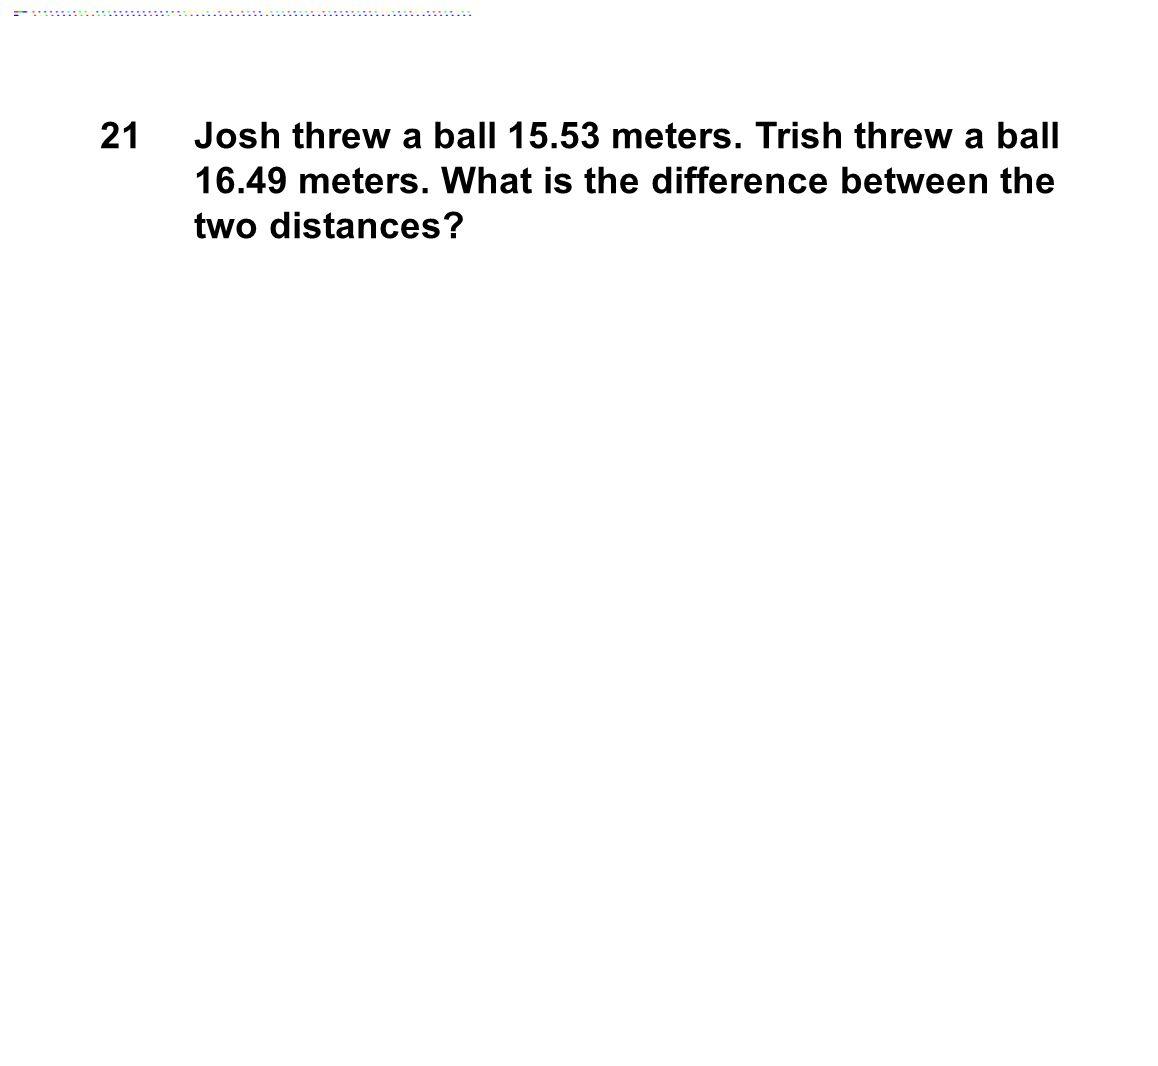 21 Josh threw a ball 15.53 meters. Trish threw a ball 16.49 meters.